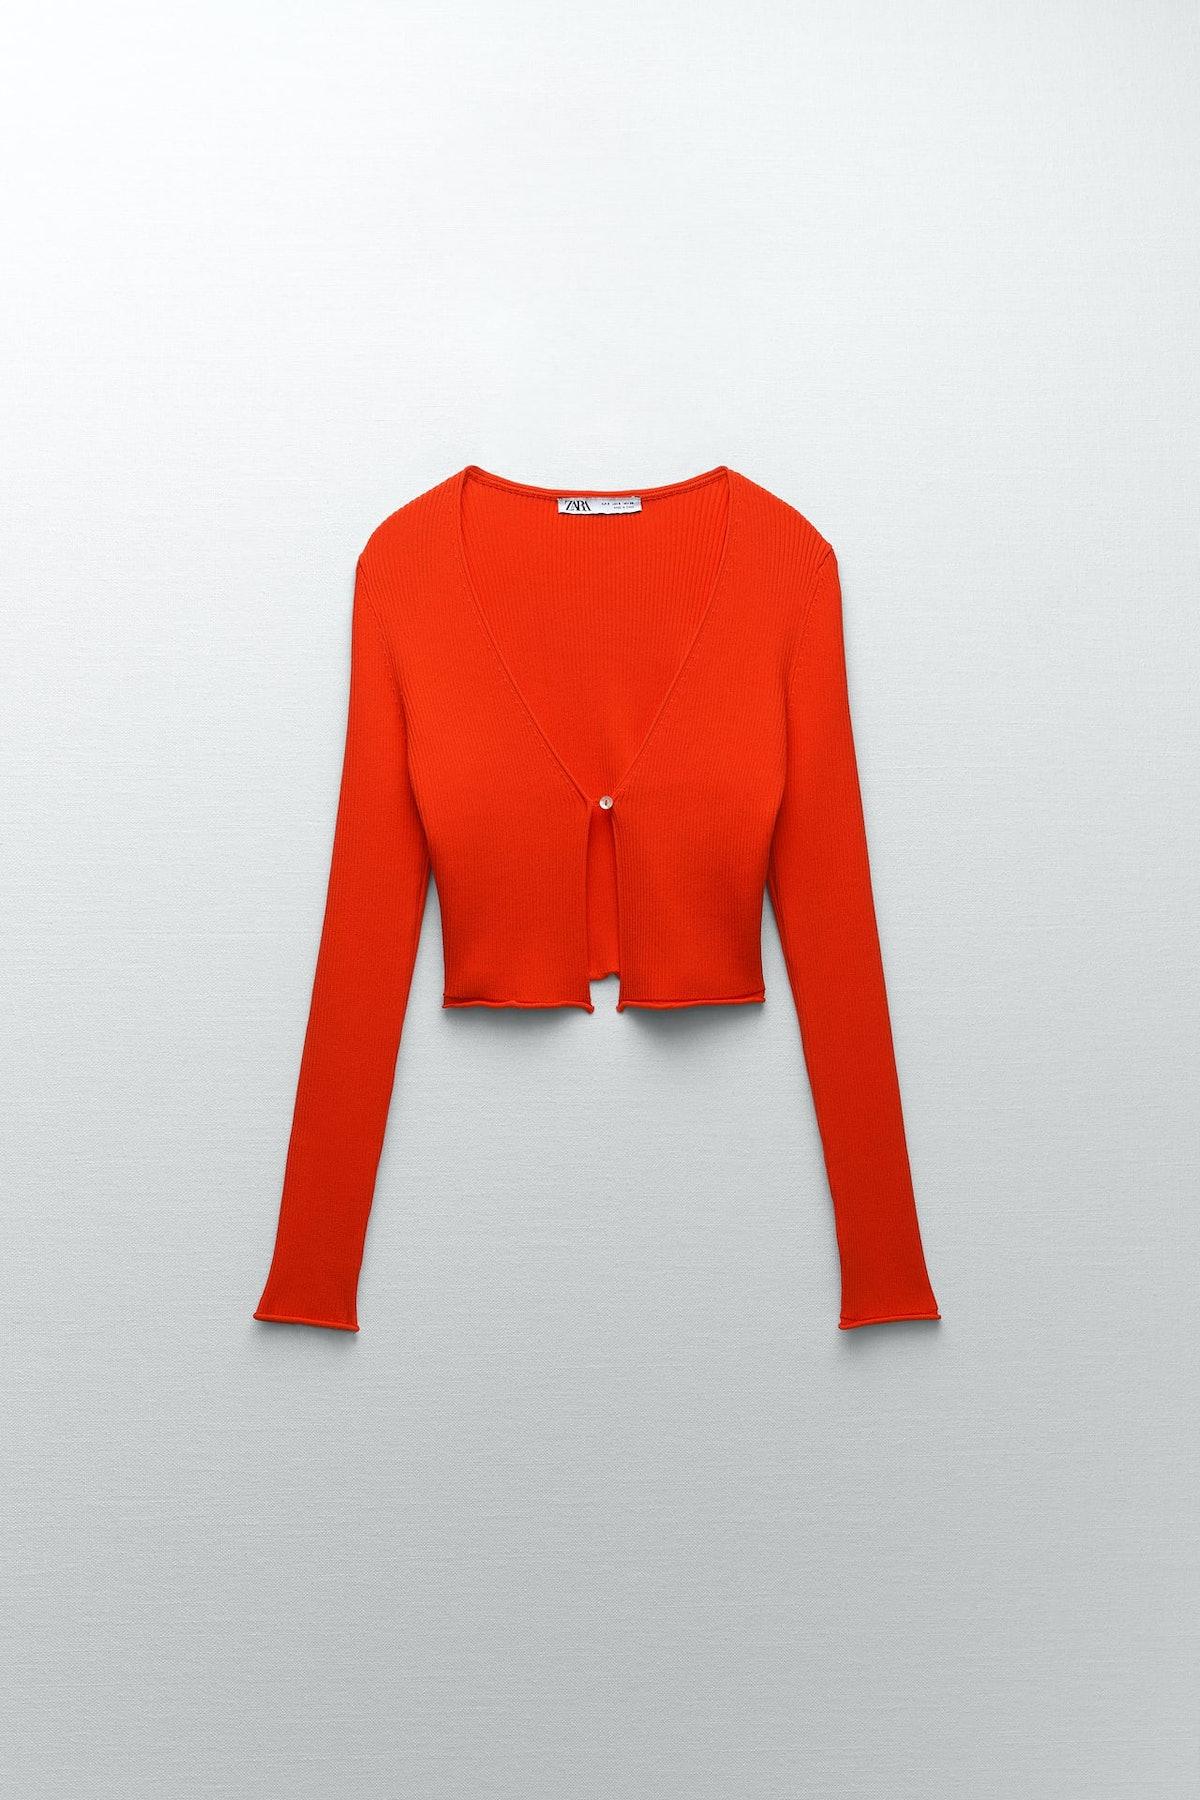 Zara Ribbed Knit Cardigan